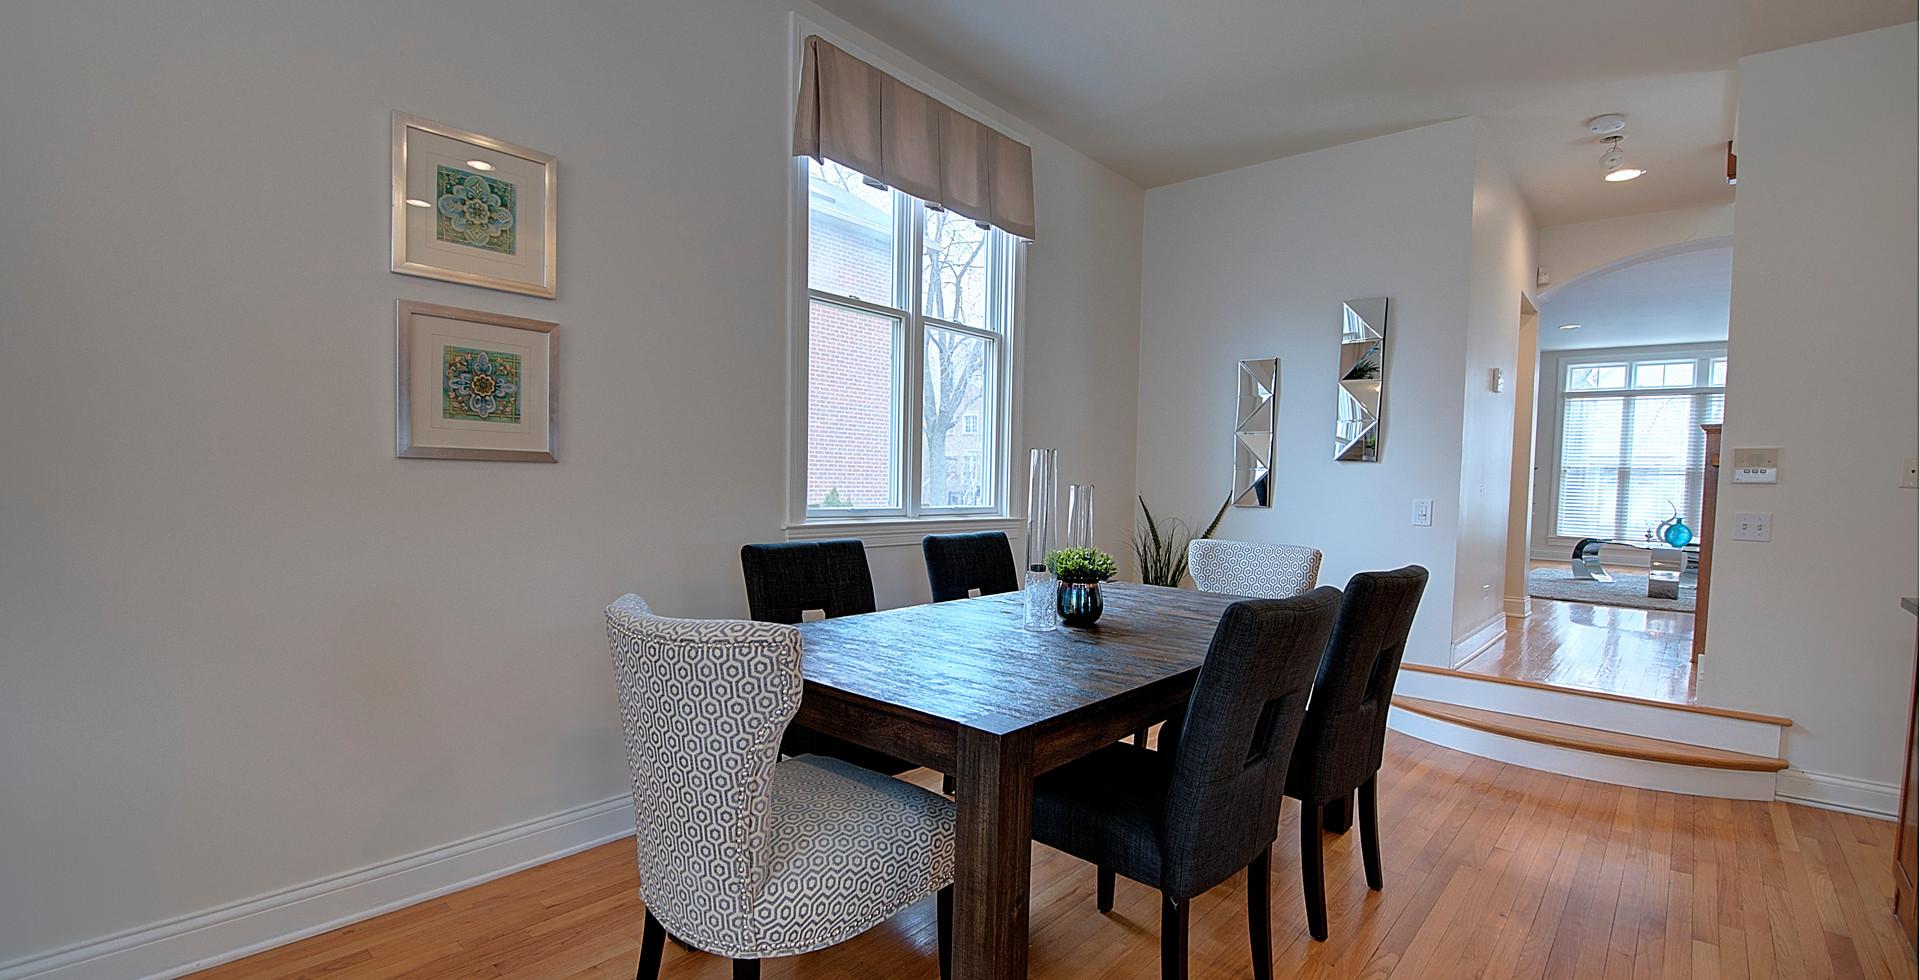 Dining Room in Park Ridge designed by MRM Home Design.jpg